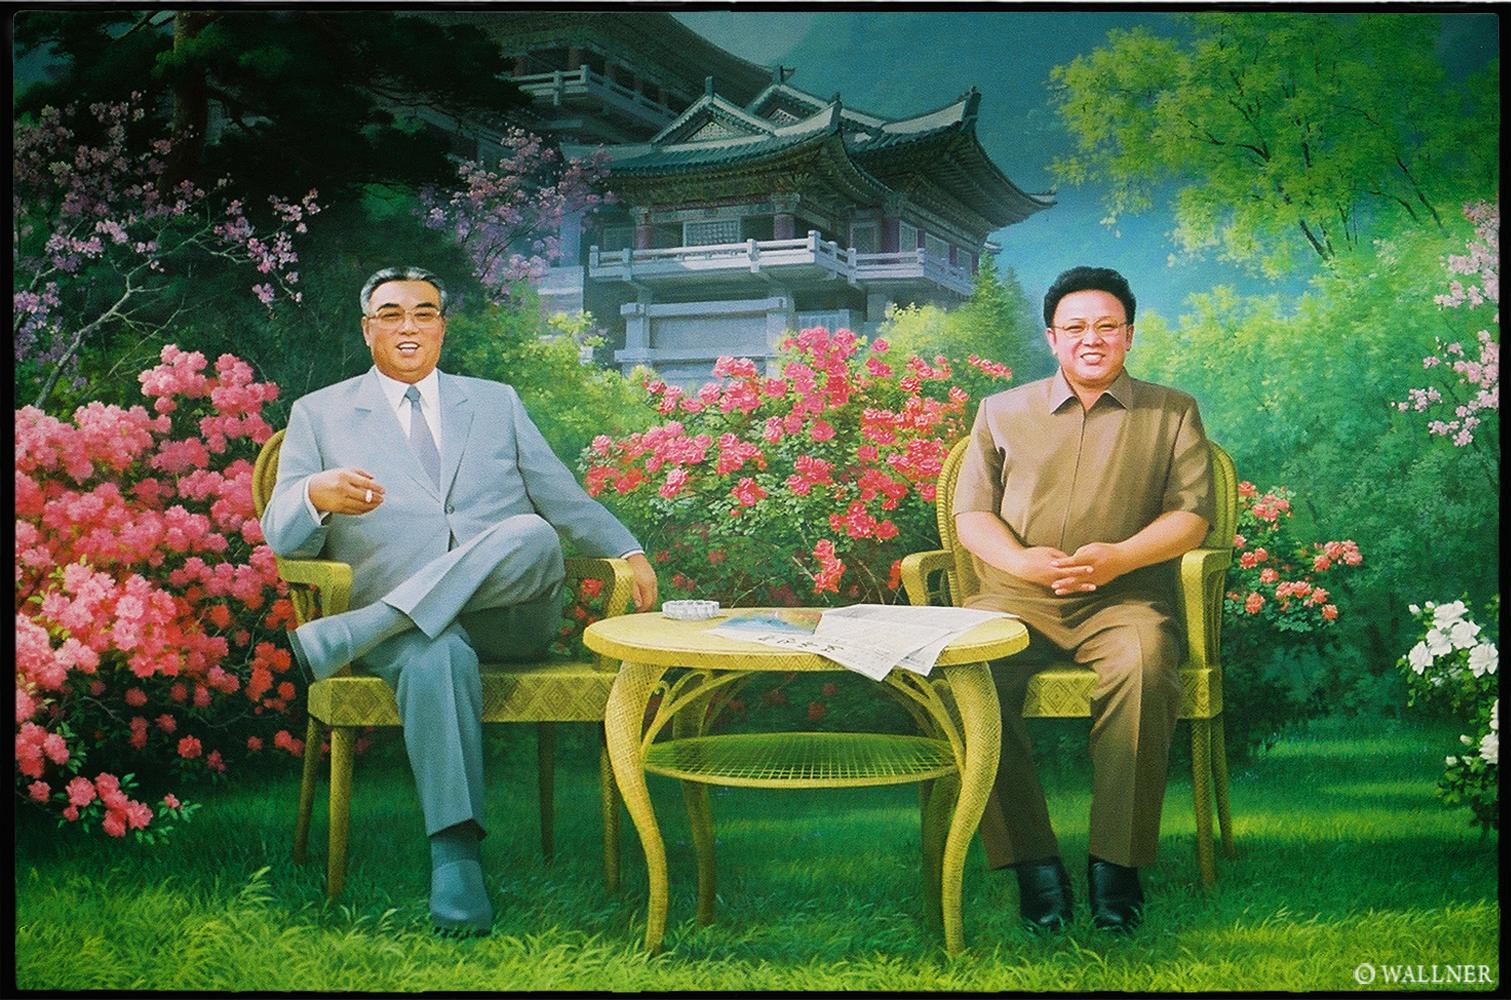 35mmPatrikWallner_Pyongyang_HotelWelcomeCloseLOWQ